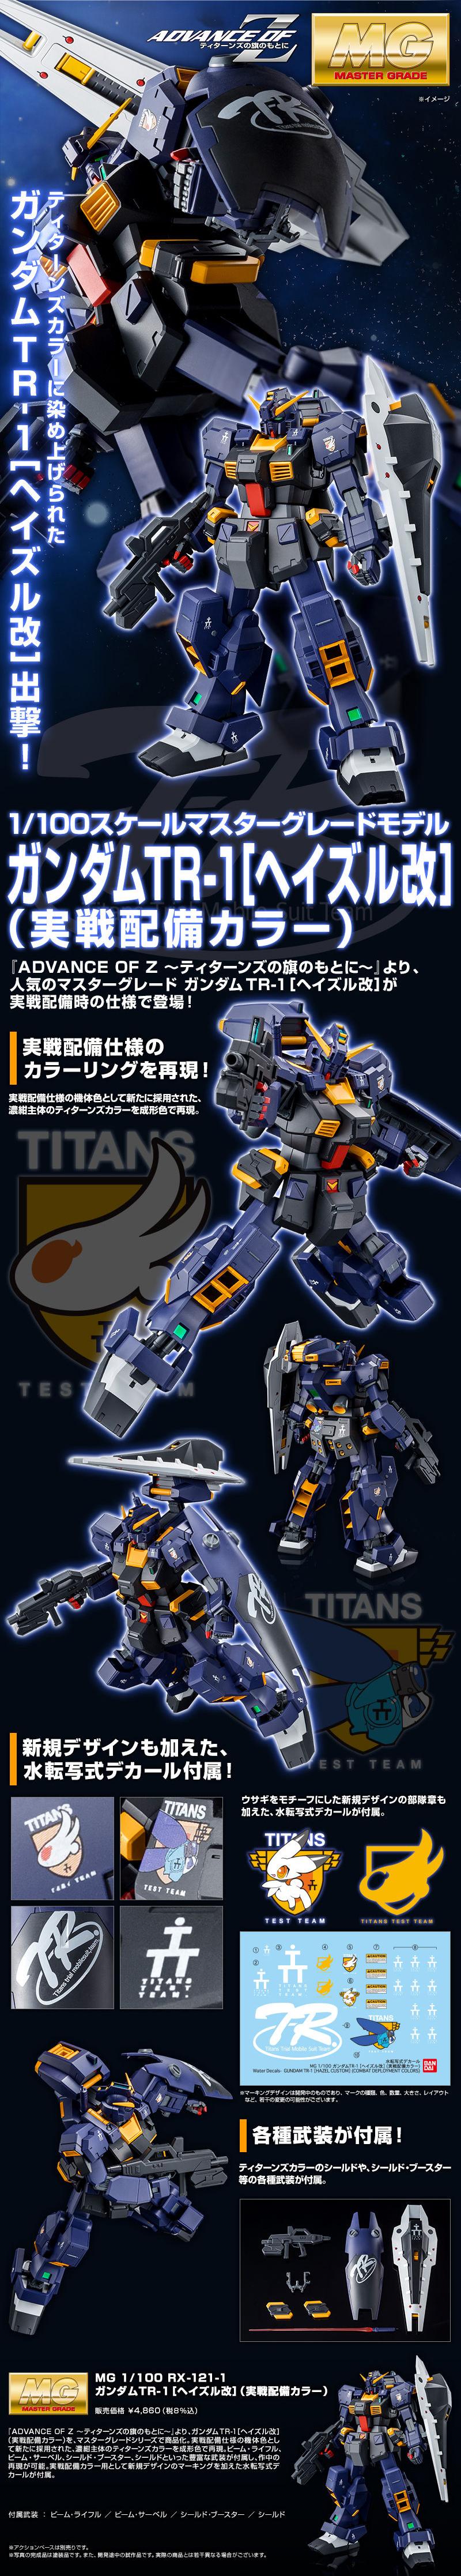 "MG 1/100 RX-121-1 ガンダムTR-1[ヘイズル改](実戦配備カラー) [Gundam TR-1 [Hazel Custom] ""Combat Deployment Colors""] 公式商品説明(画像)"